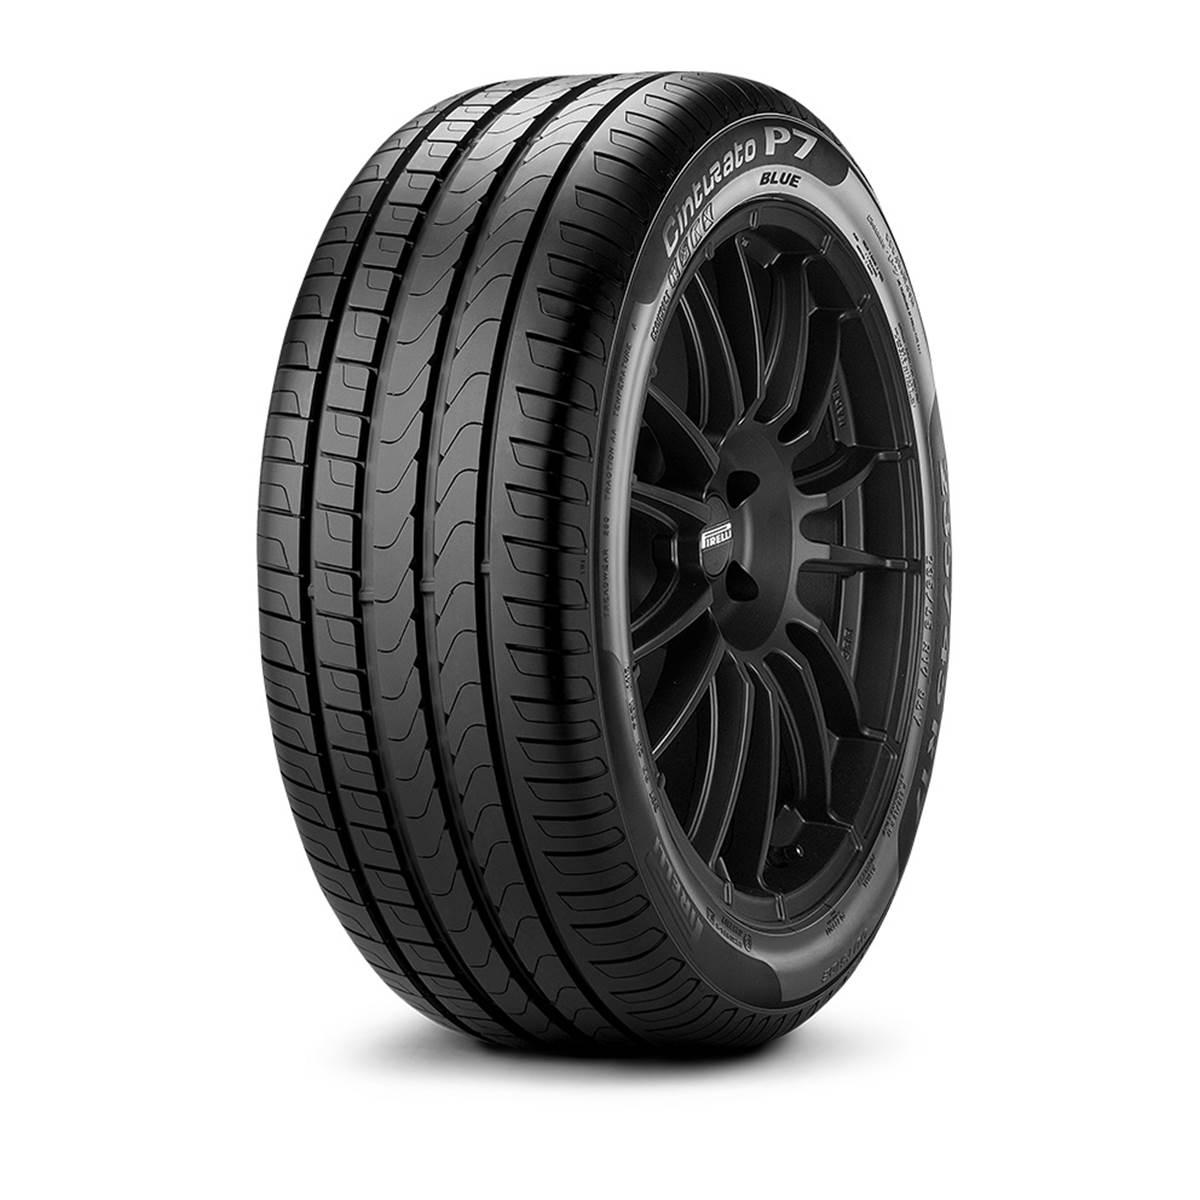 Pneu Pirelli 215/50R17 95W Cinturato P7 Blue XL